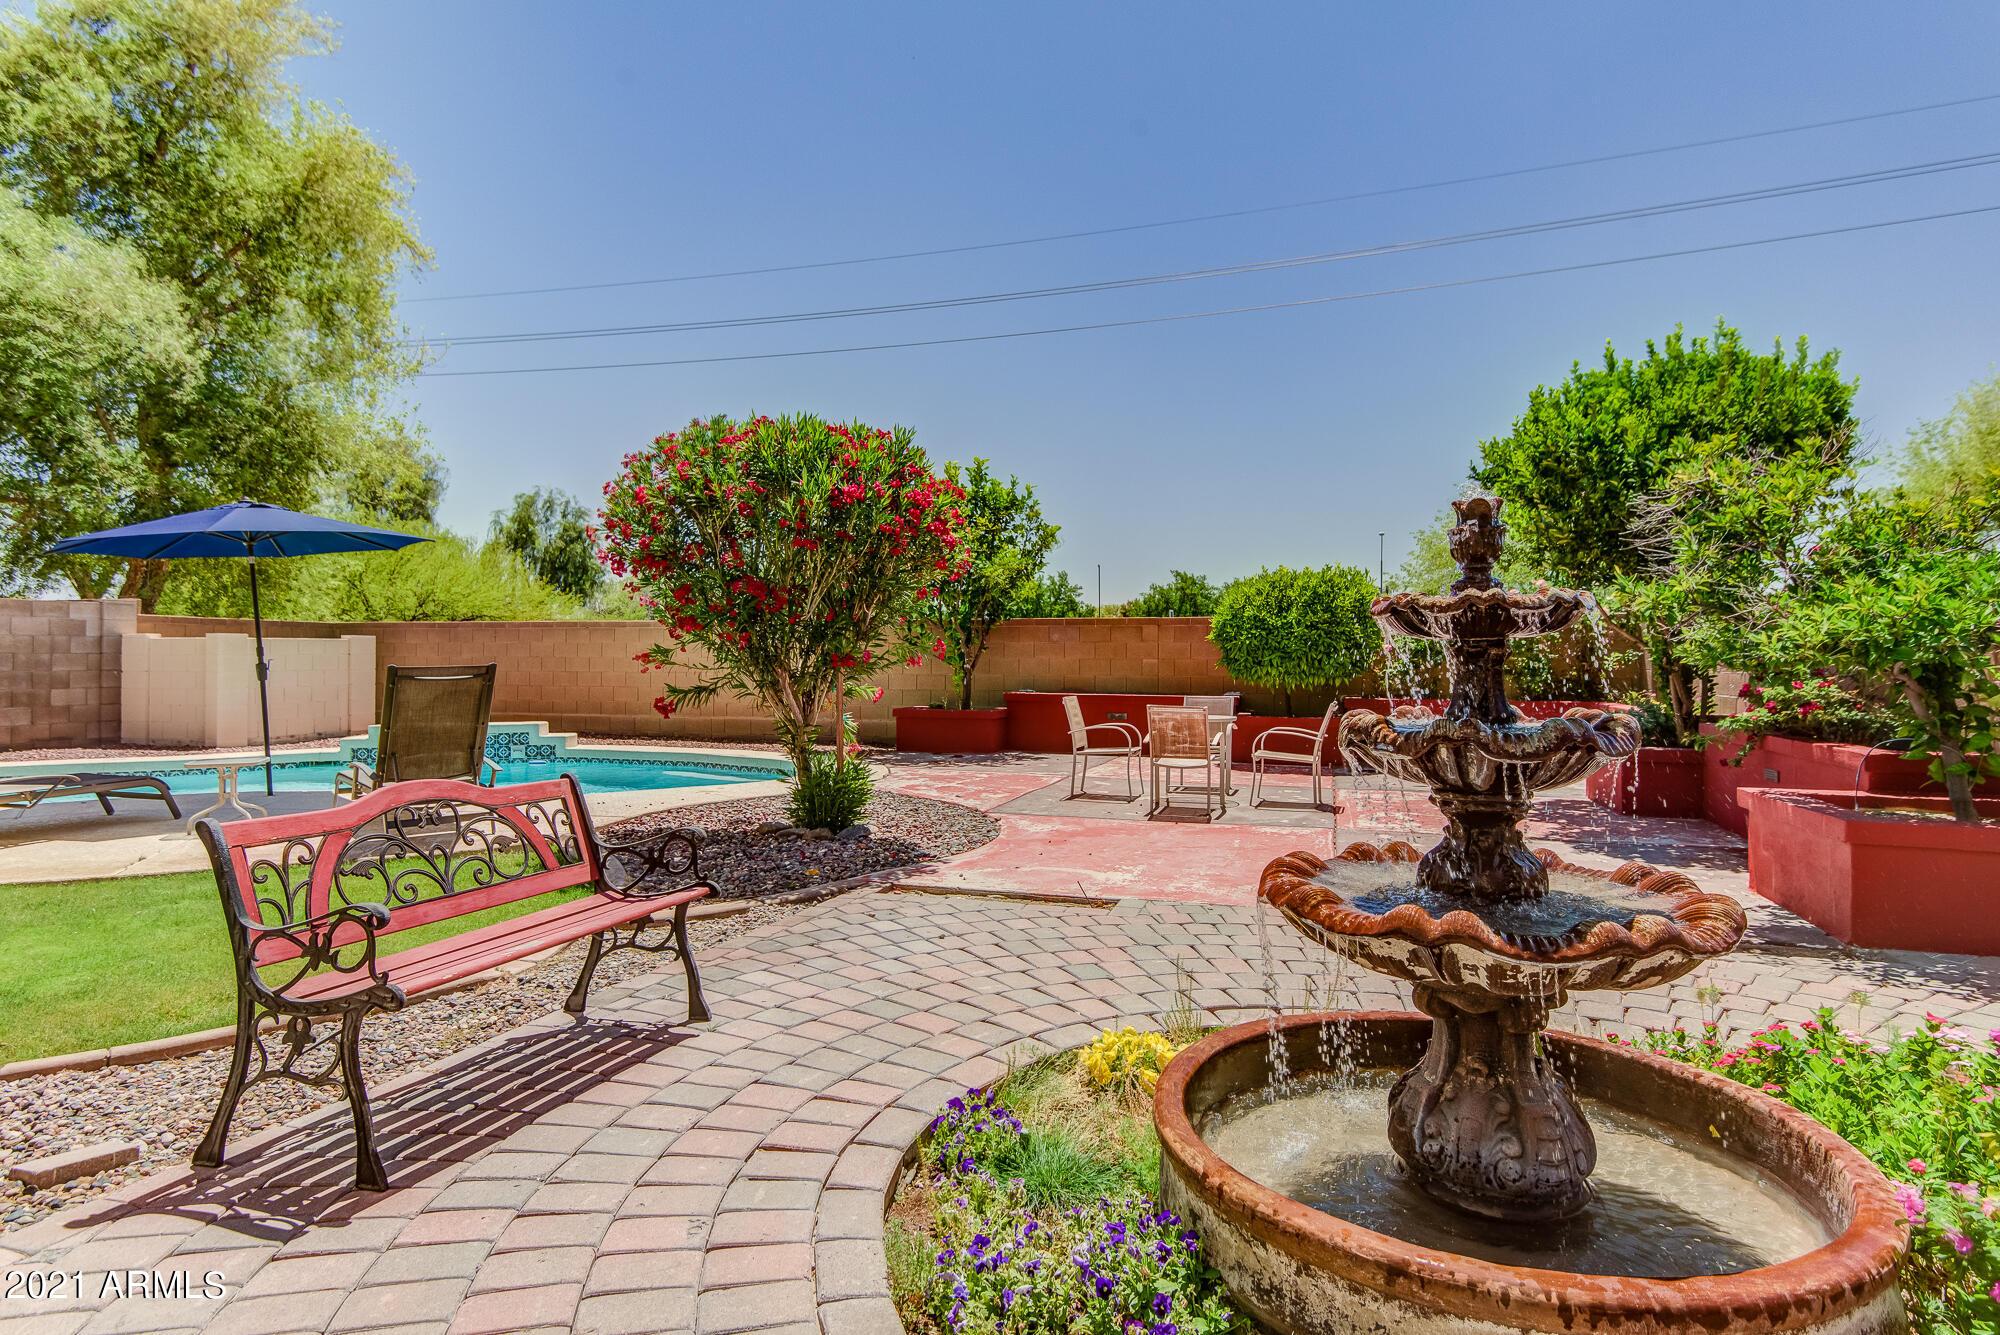 845 SAGITTARIUS Place, Chandler, Arizona 85249, 4 Bedrooms Bedrooms, ,3.5 BathroomsBathrooms,Residential,For Sale,SAGITTARIUS,6224820